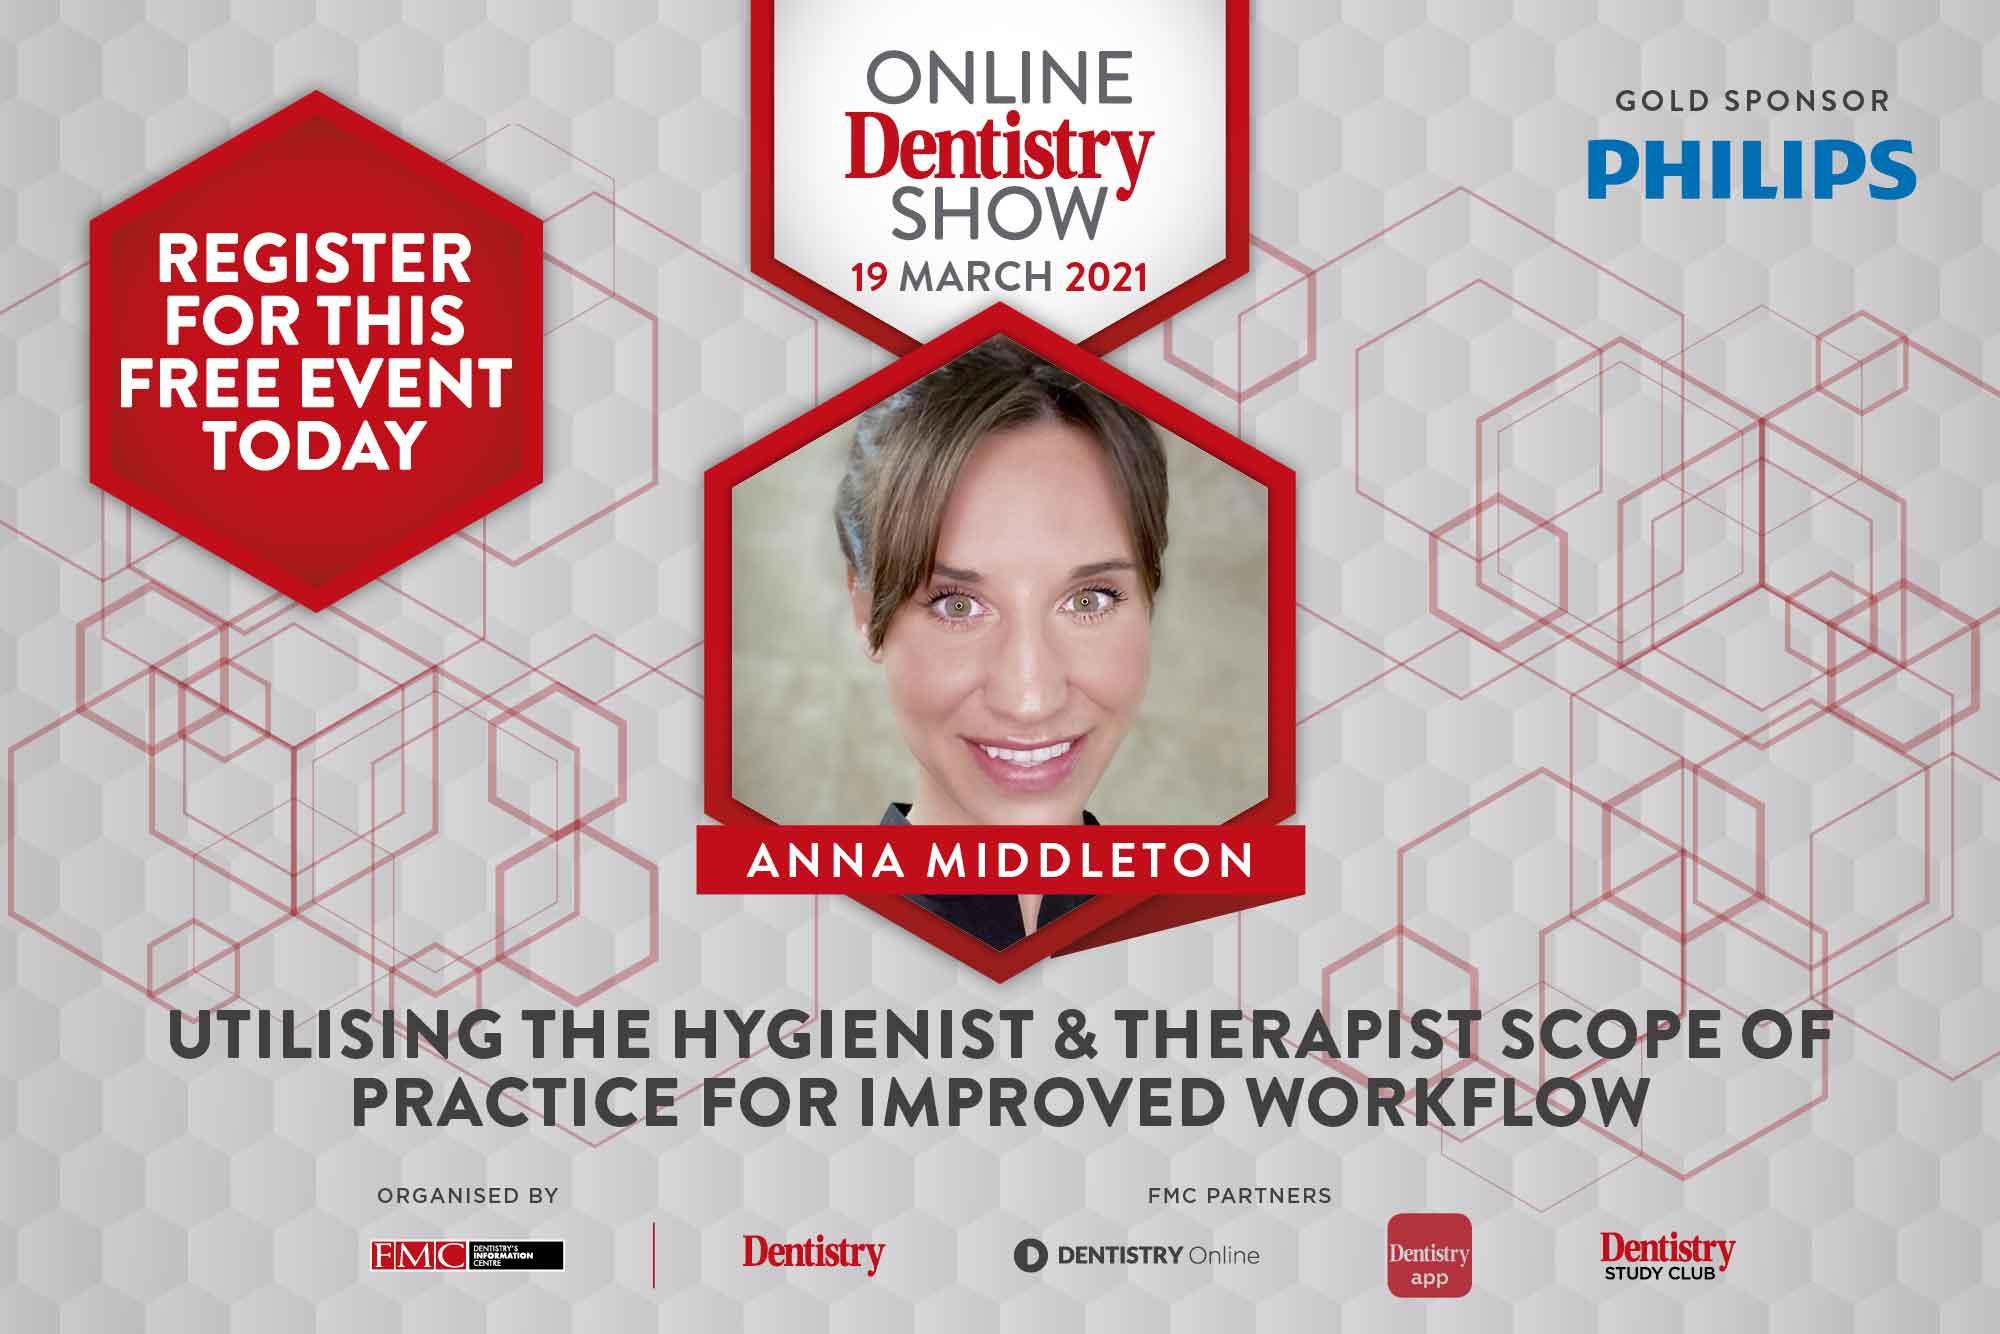 Online Dentistry Show Anna Middleton